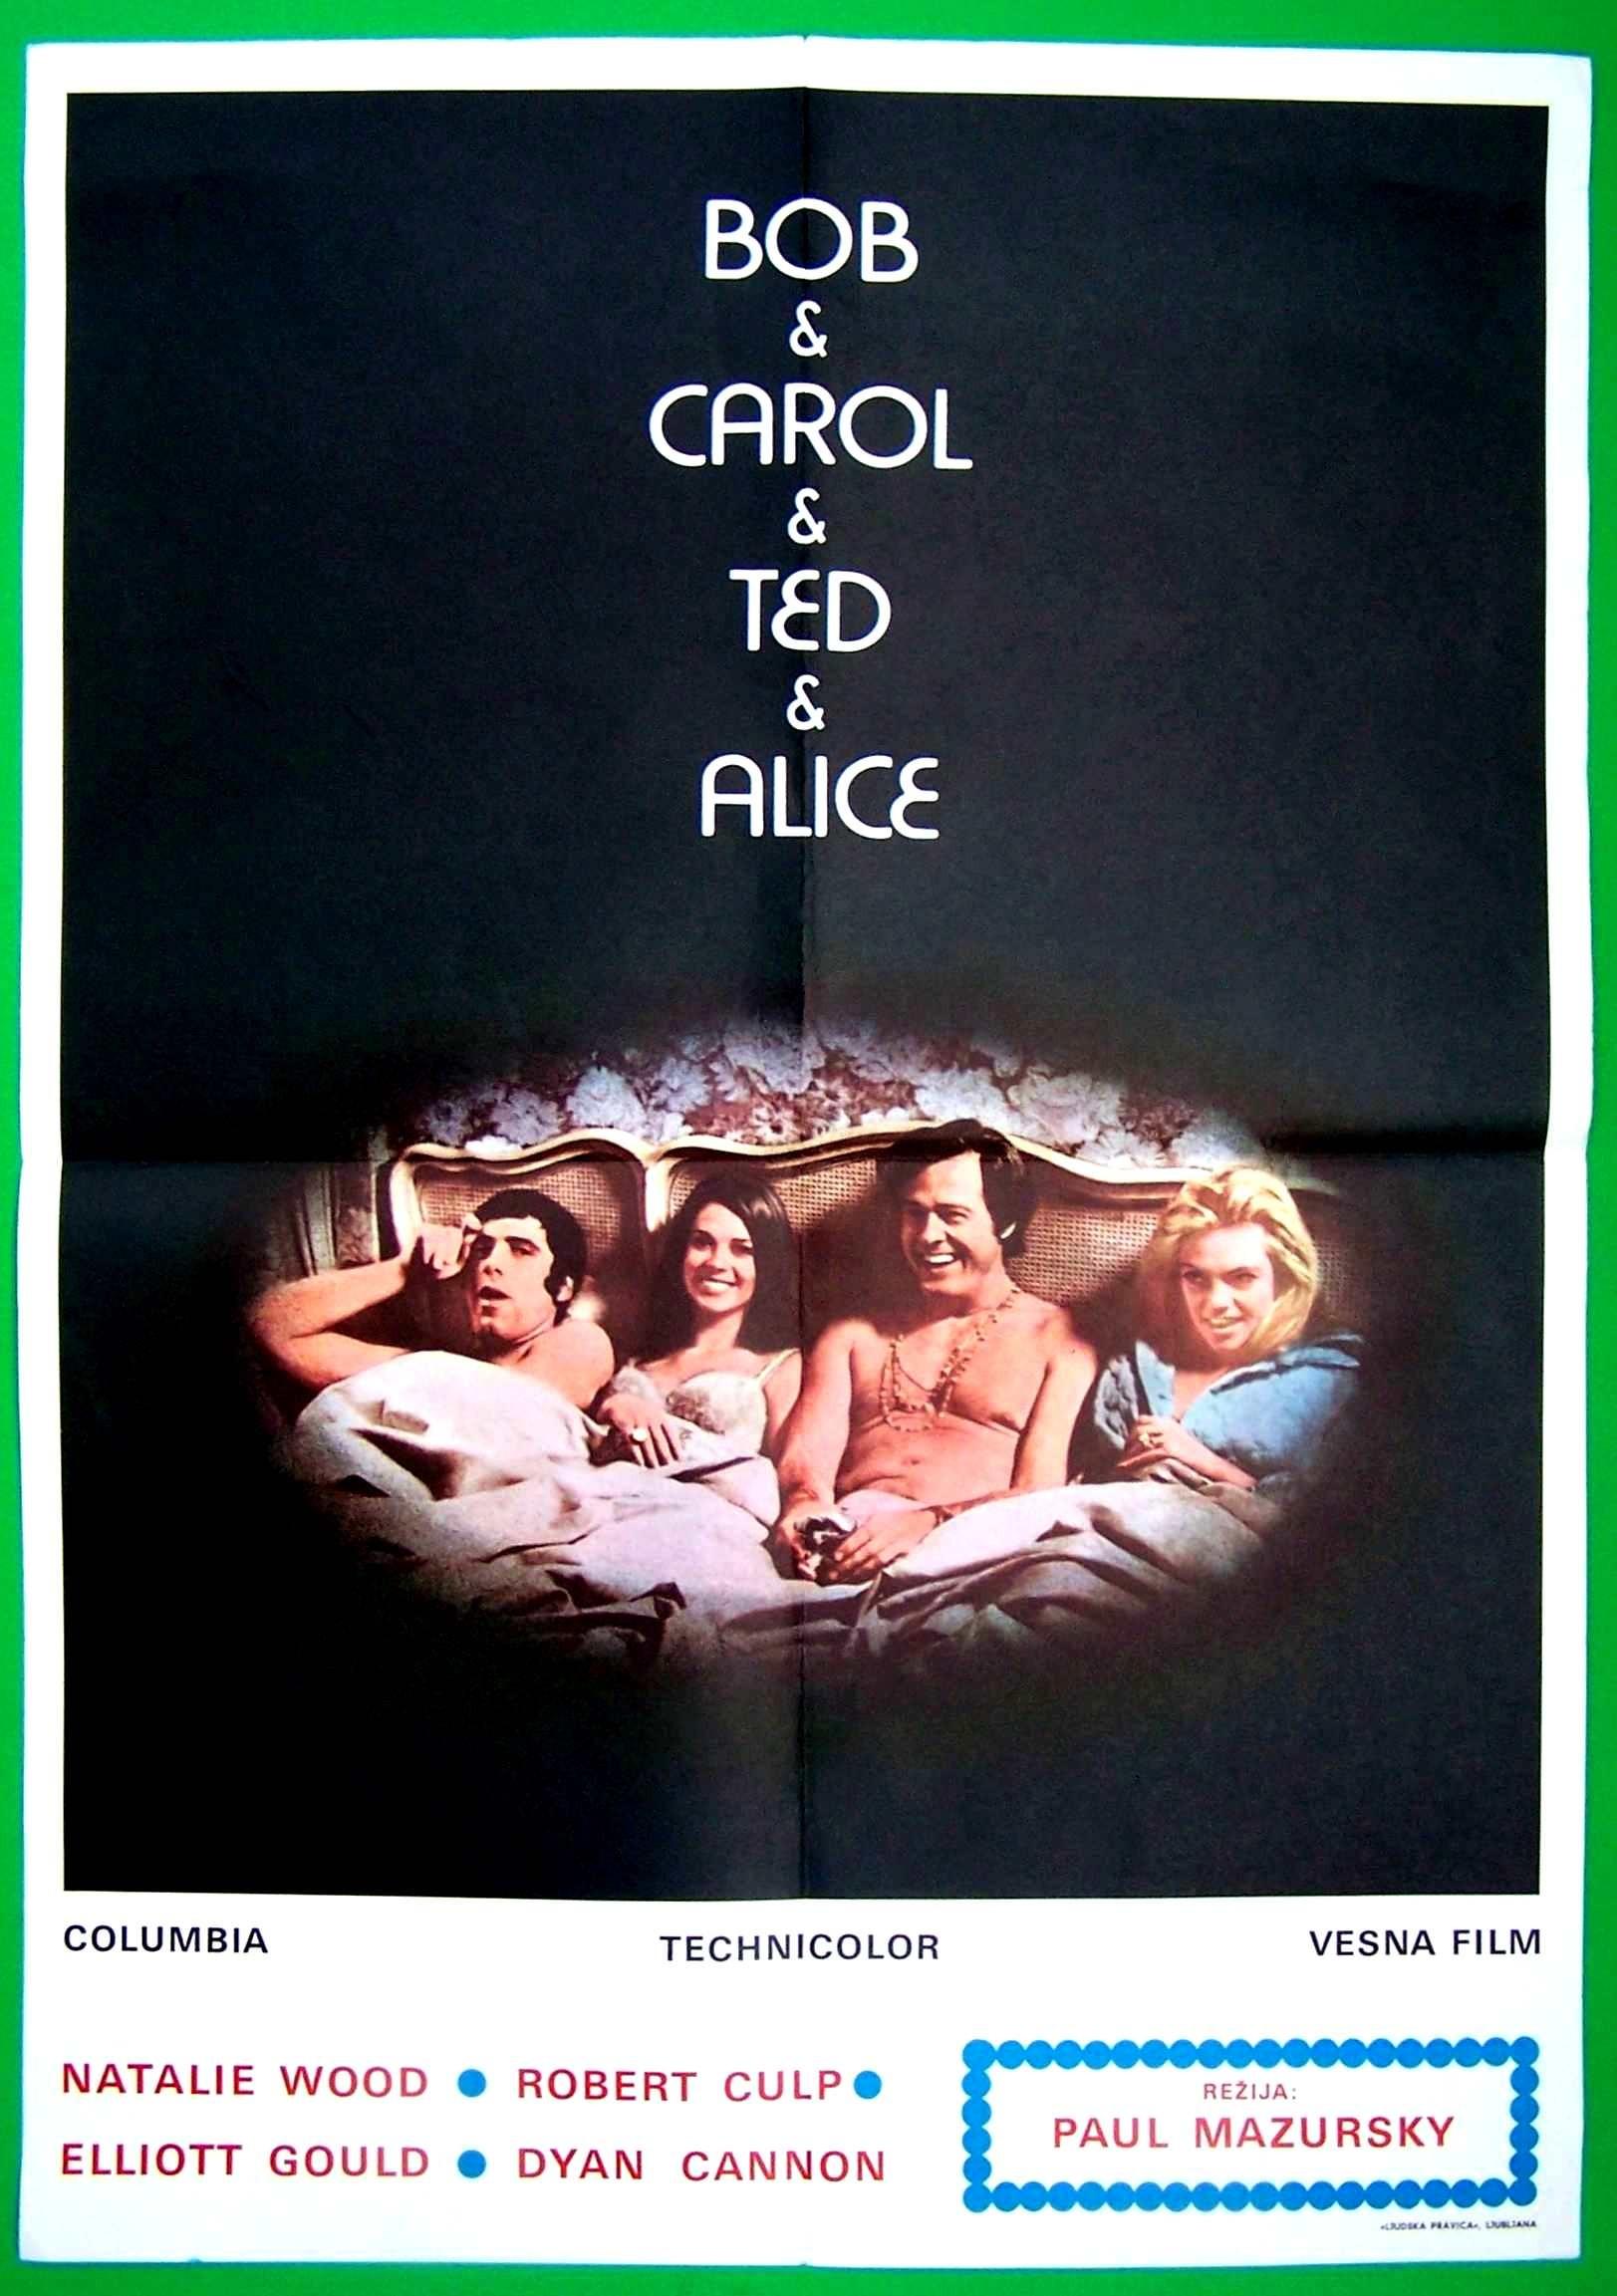 Bob Carol Ted Alice